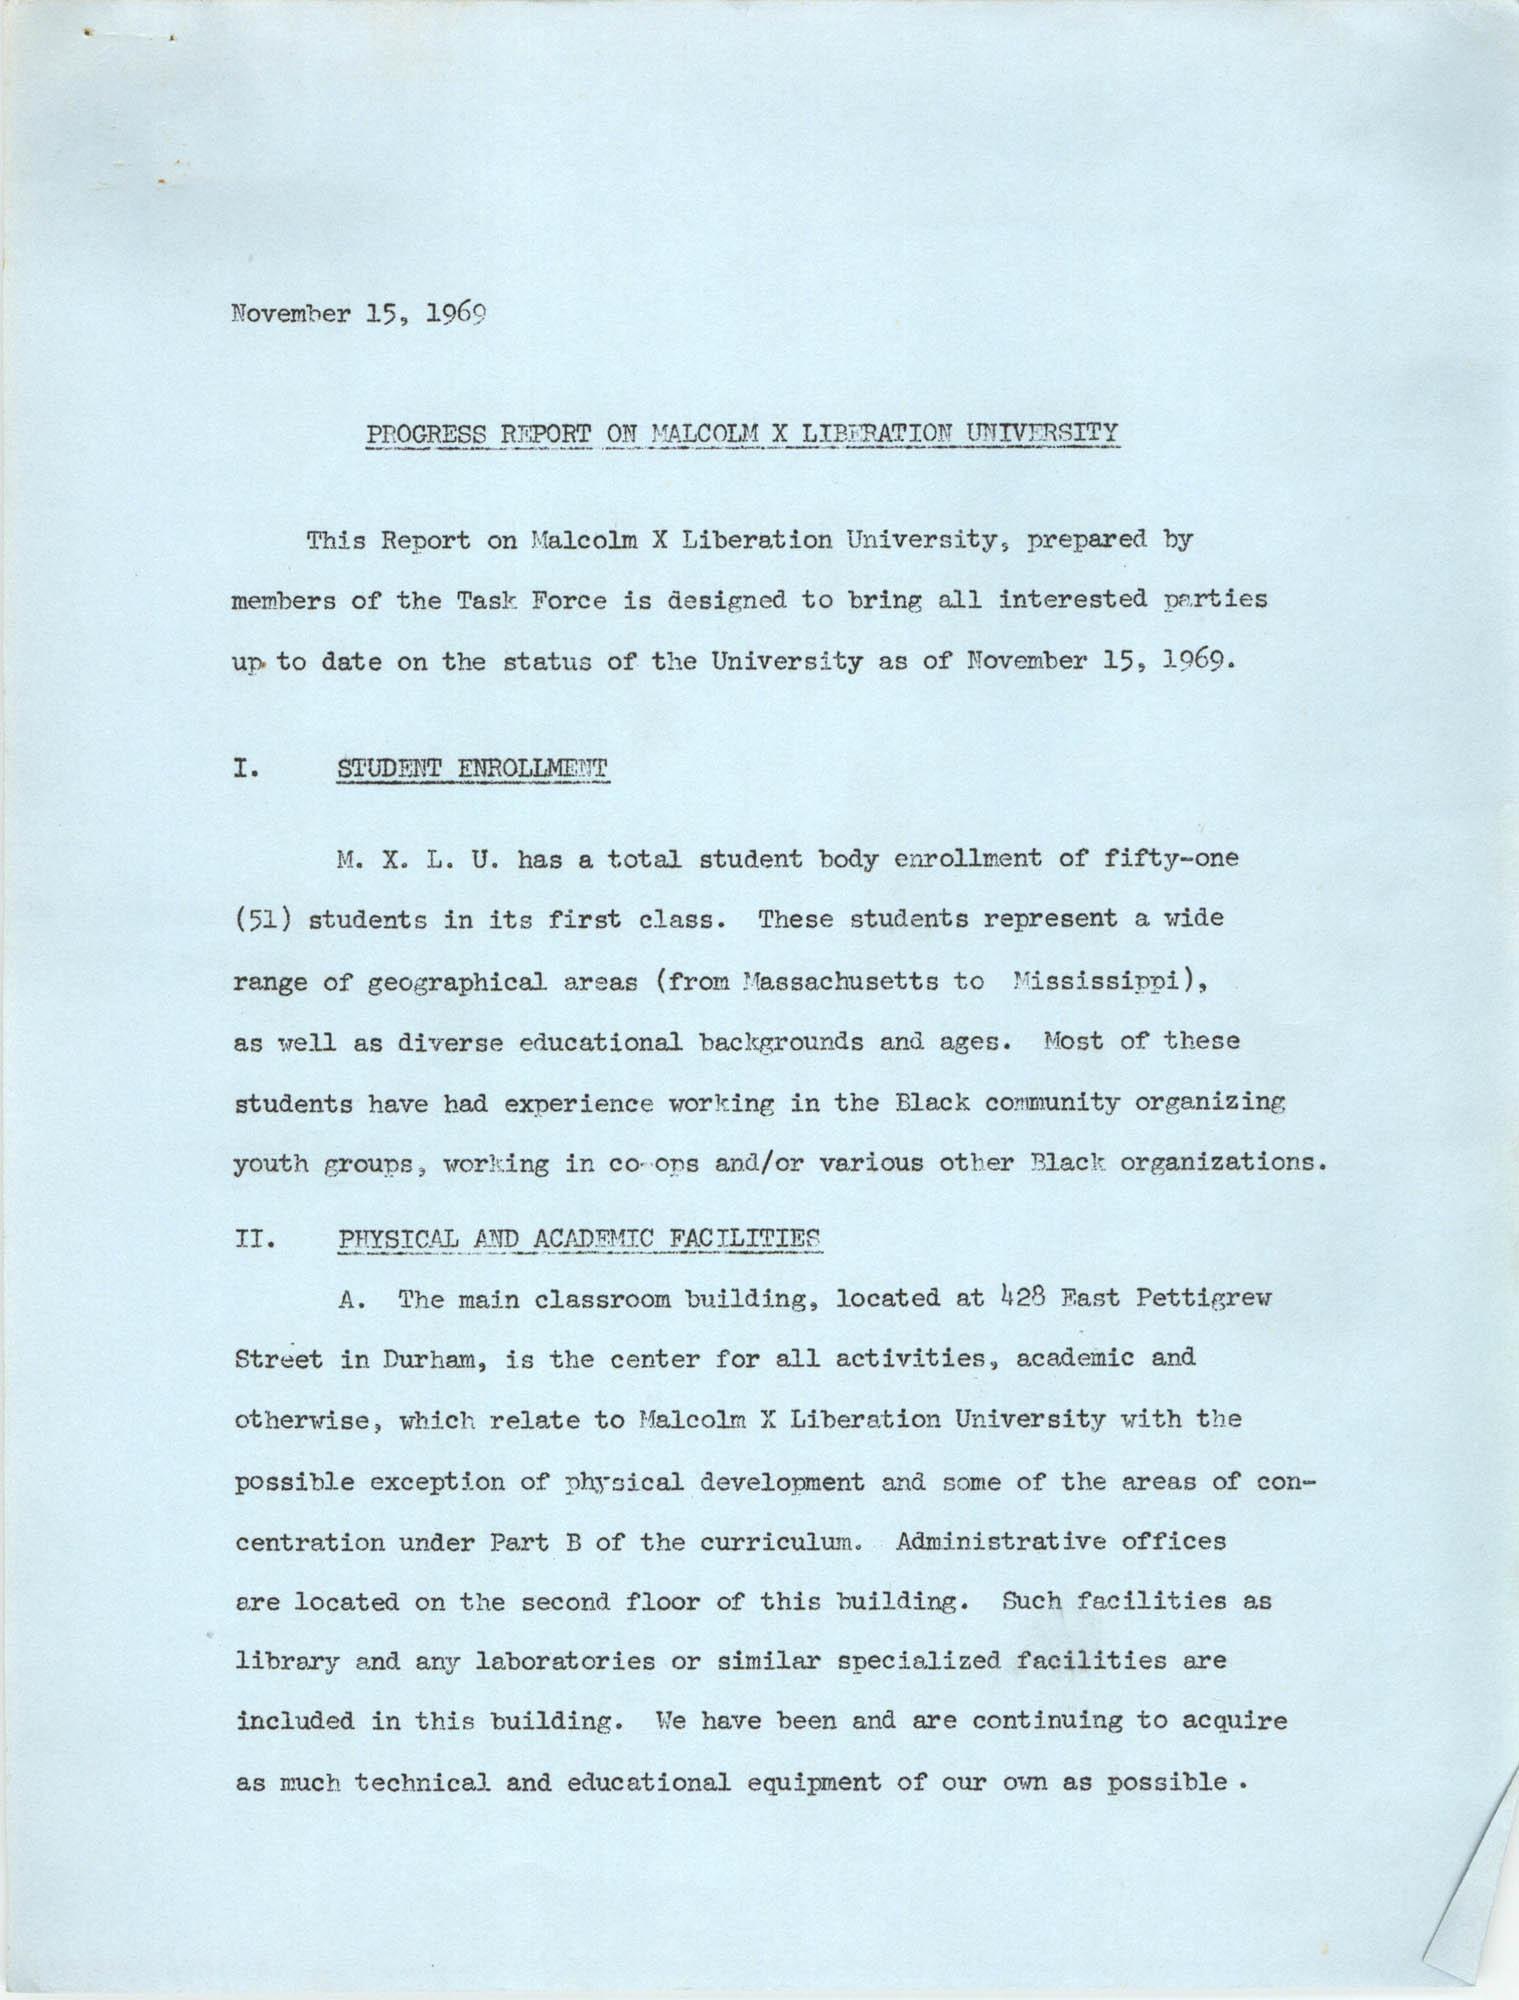 Progress Report on Malcolm X Liberation University, November 15, 1969